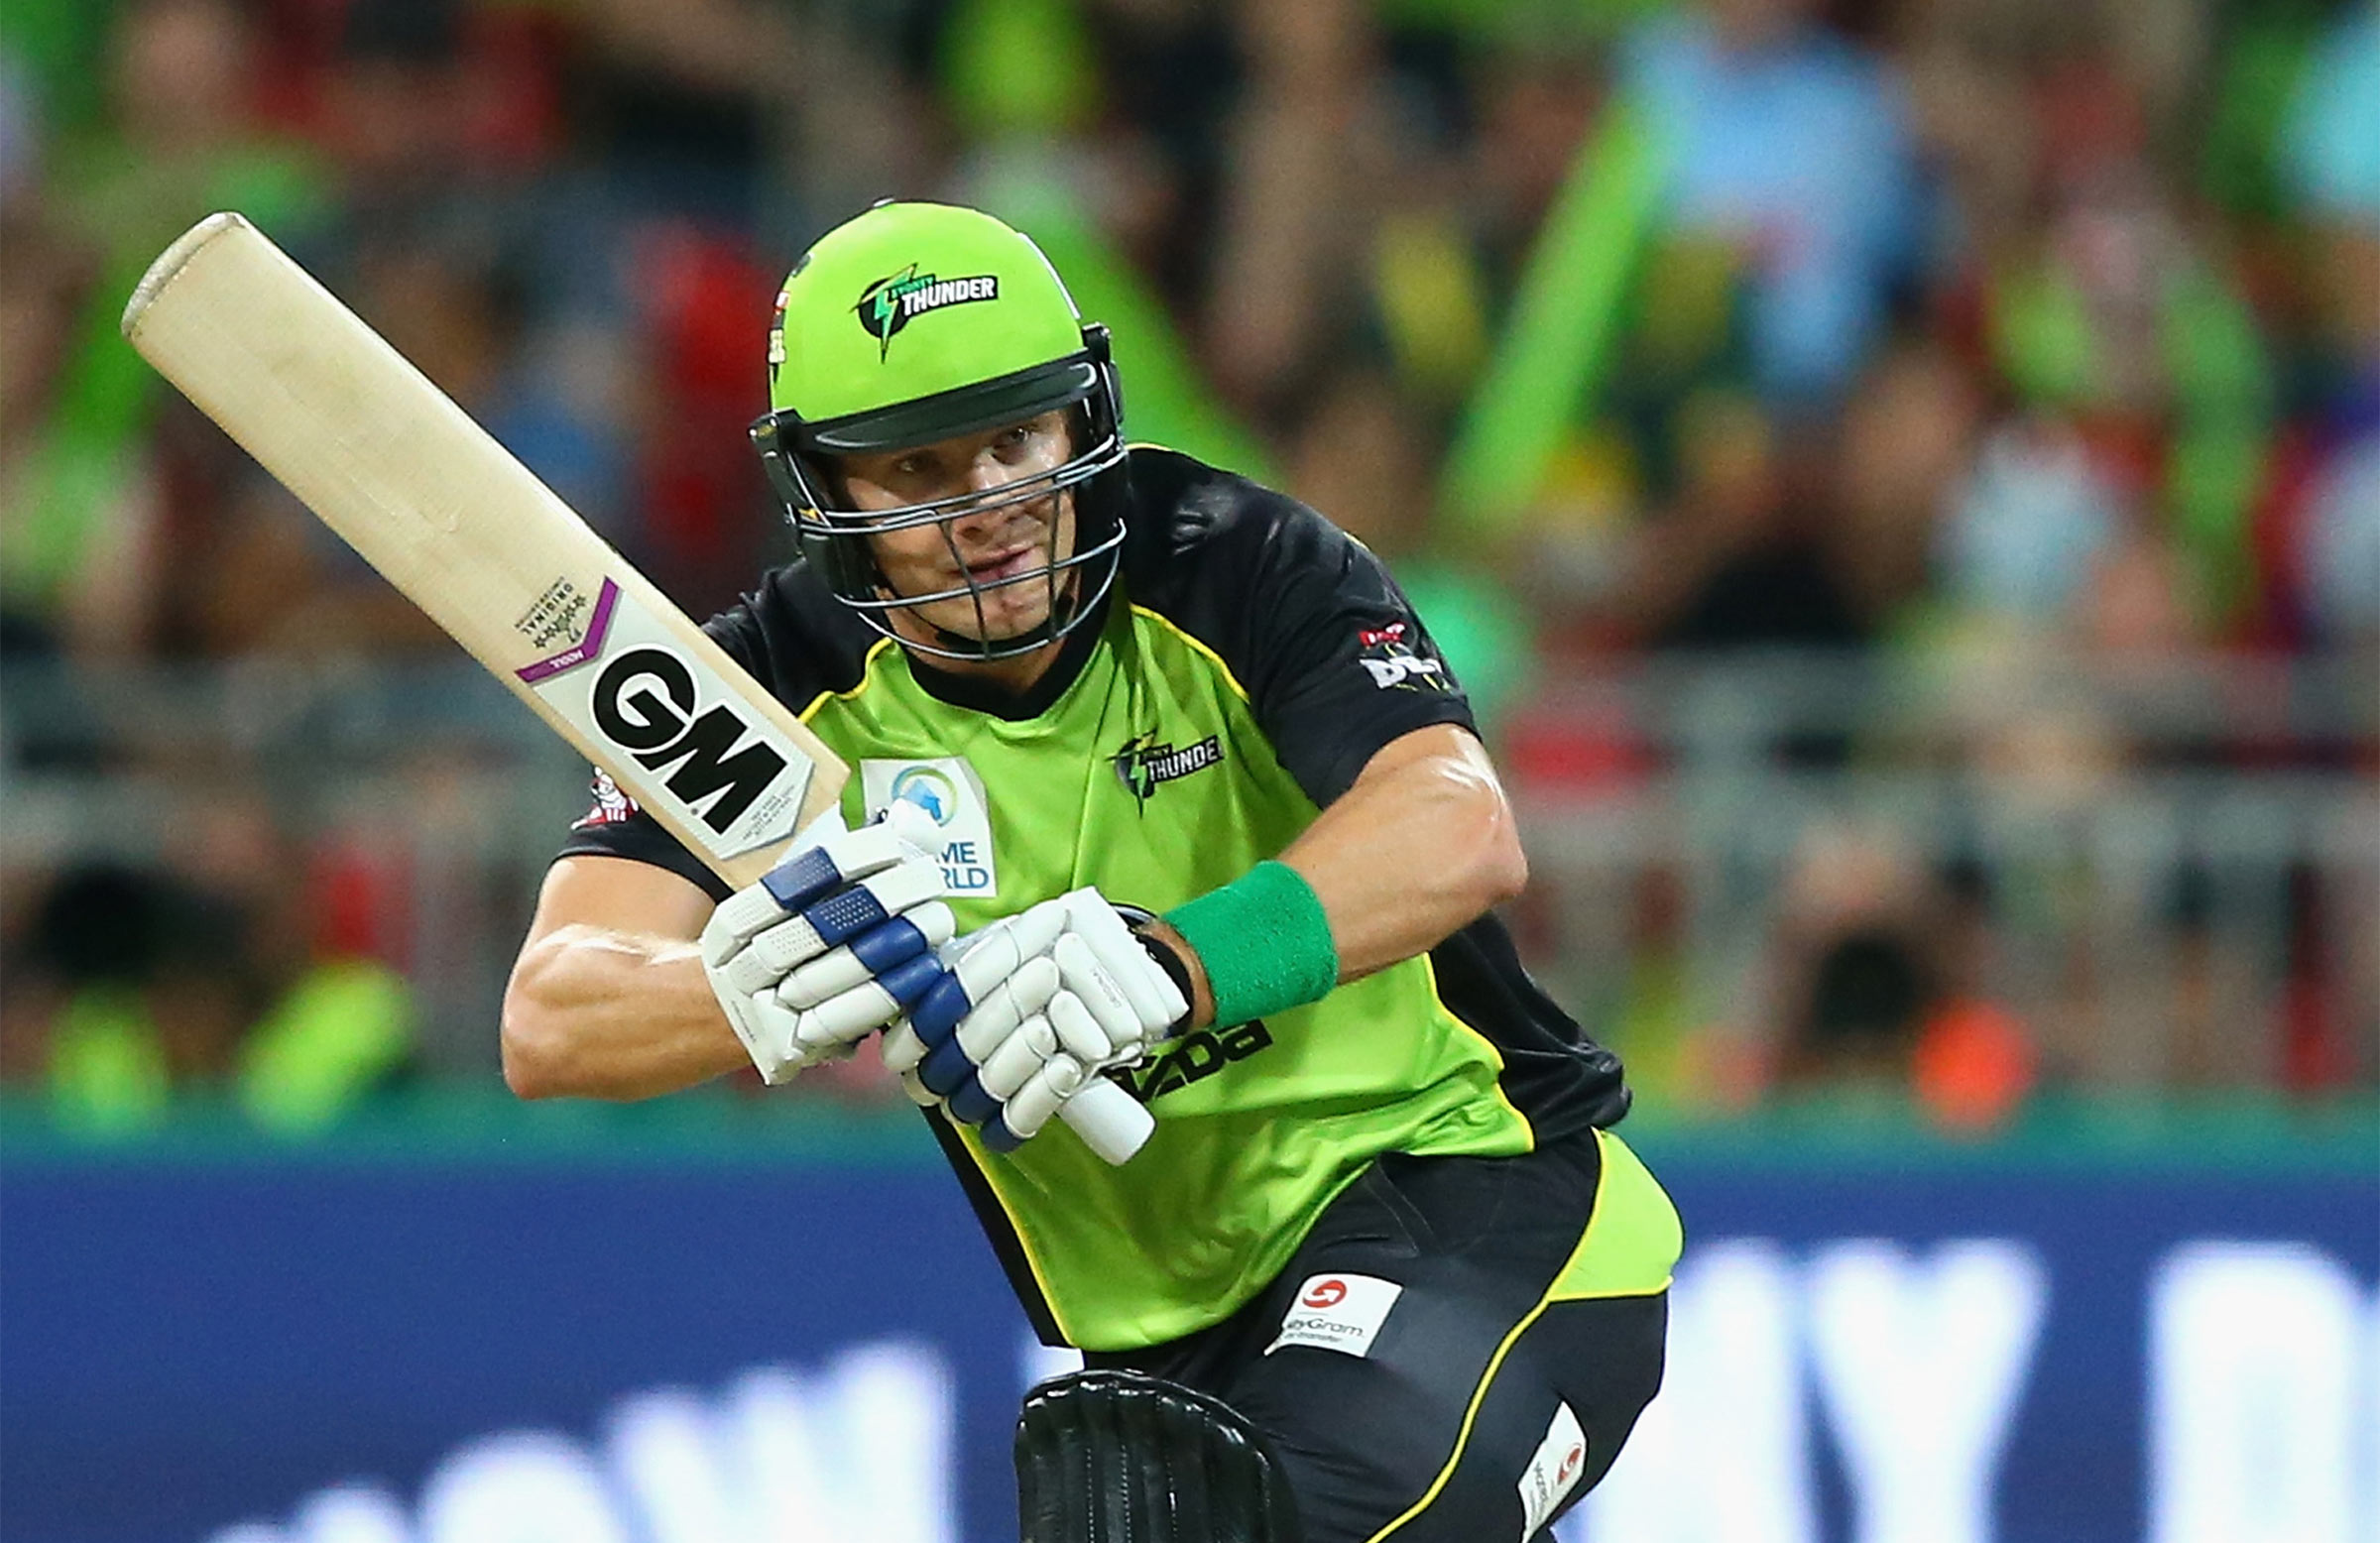 Watson against proposed law change | cricket.com.au